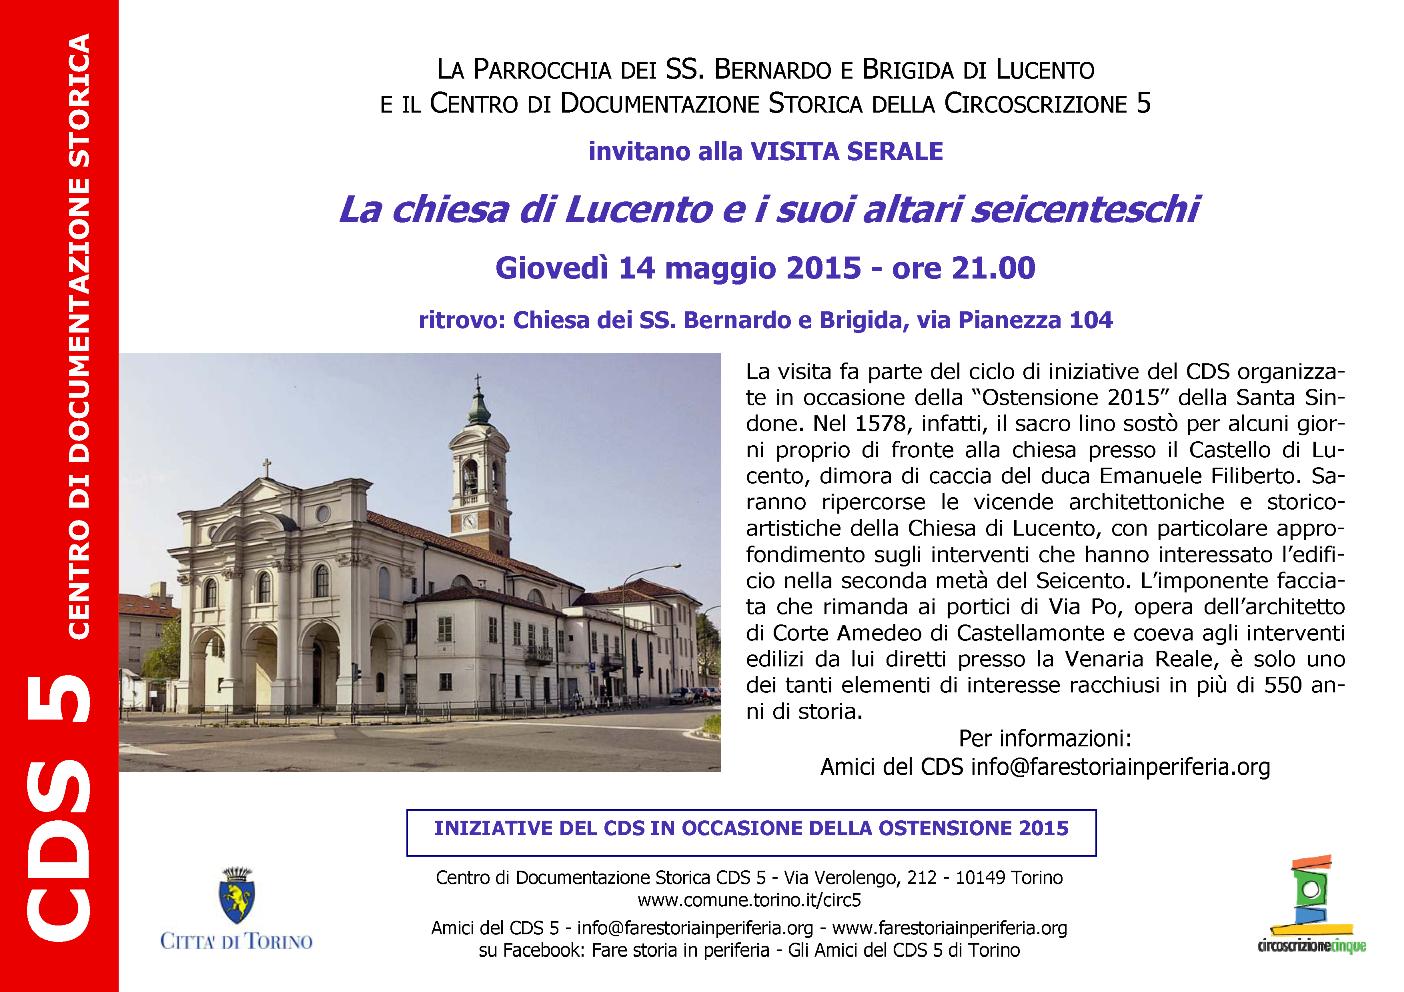 CDS Visita serale chiesa Lucento e altari seicenteschi 14-05-2015